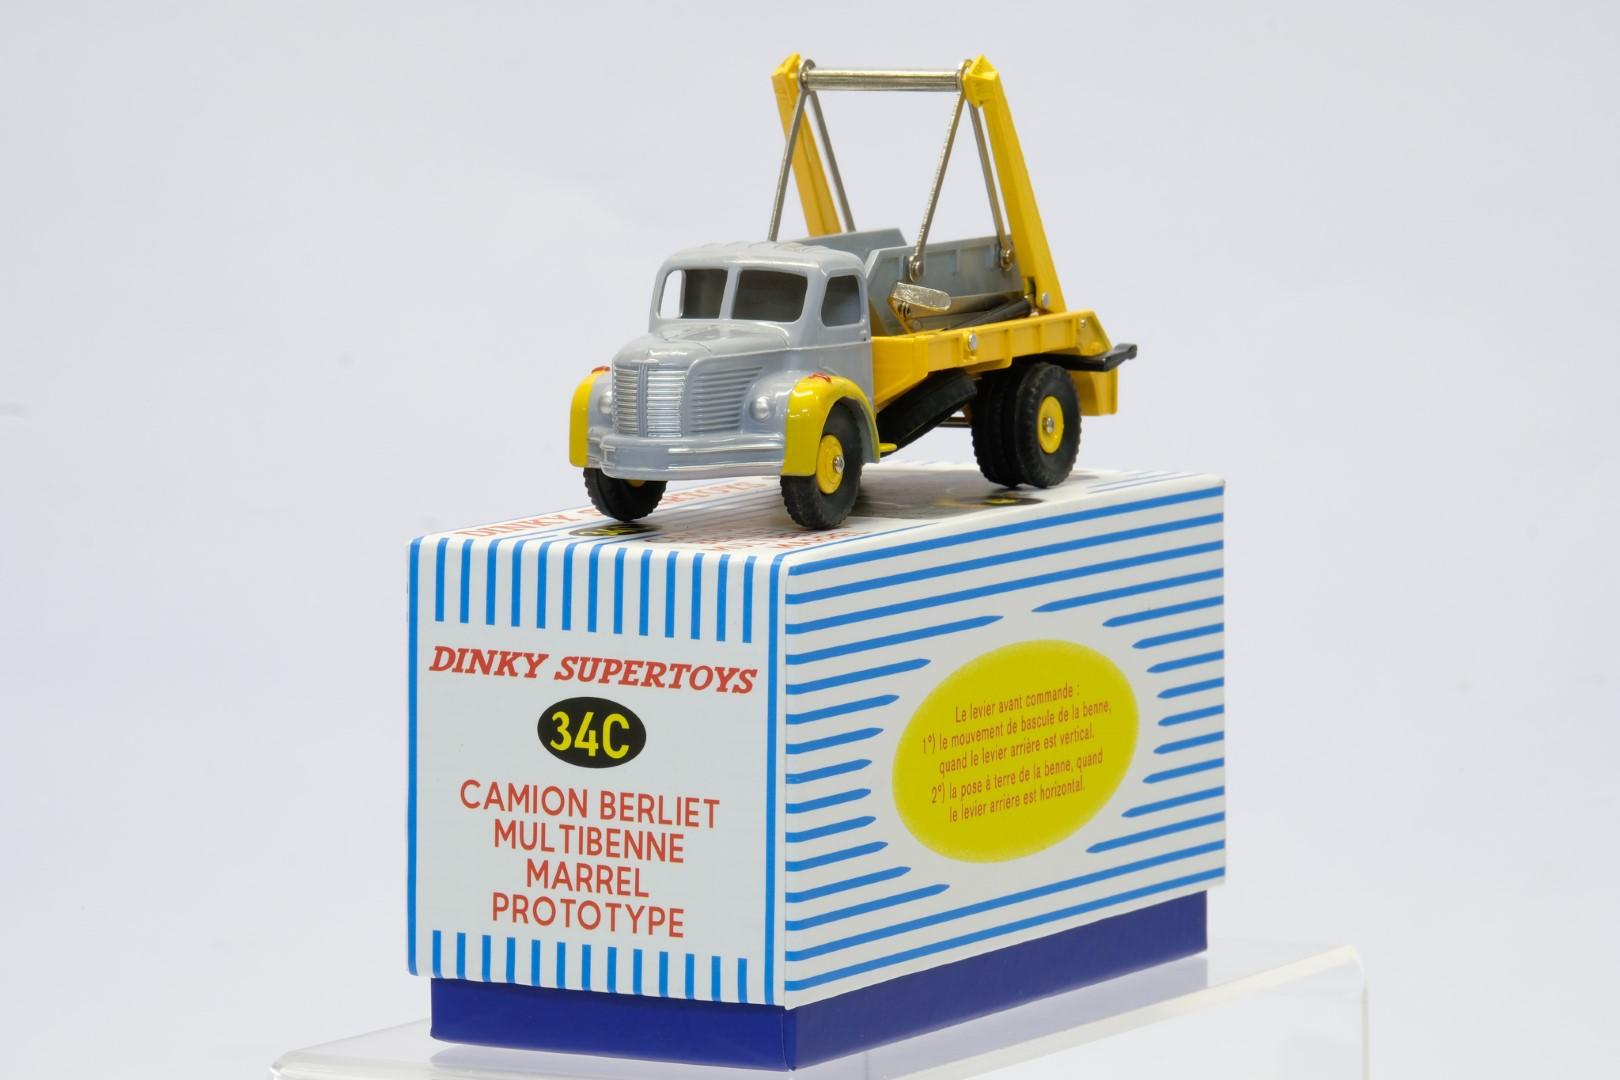 Atlas Dinky Toys Camion Berliet Multibenne Marrel - Image 2 of 3